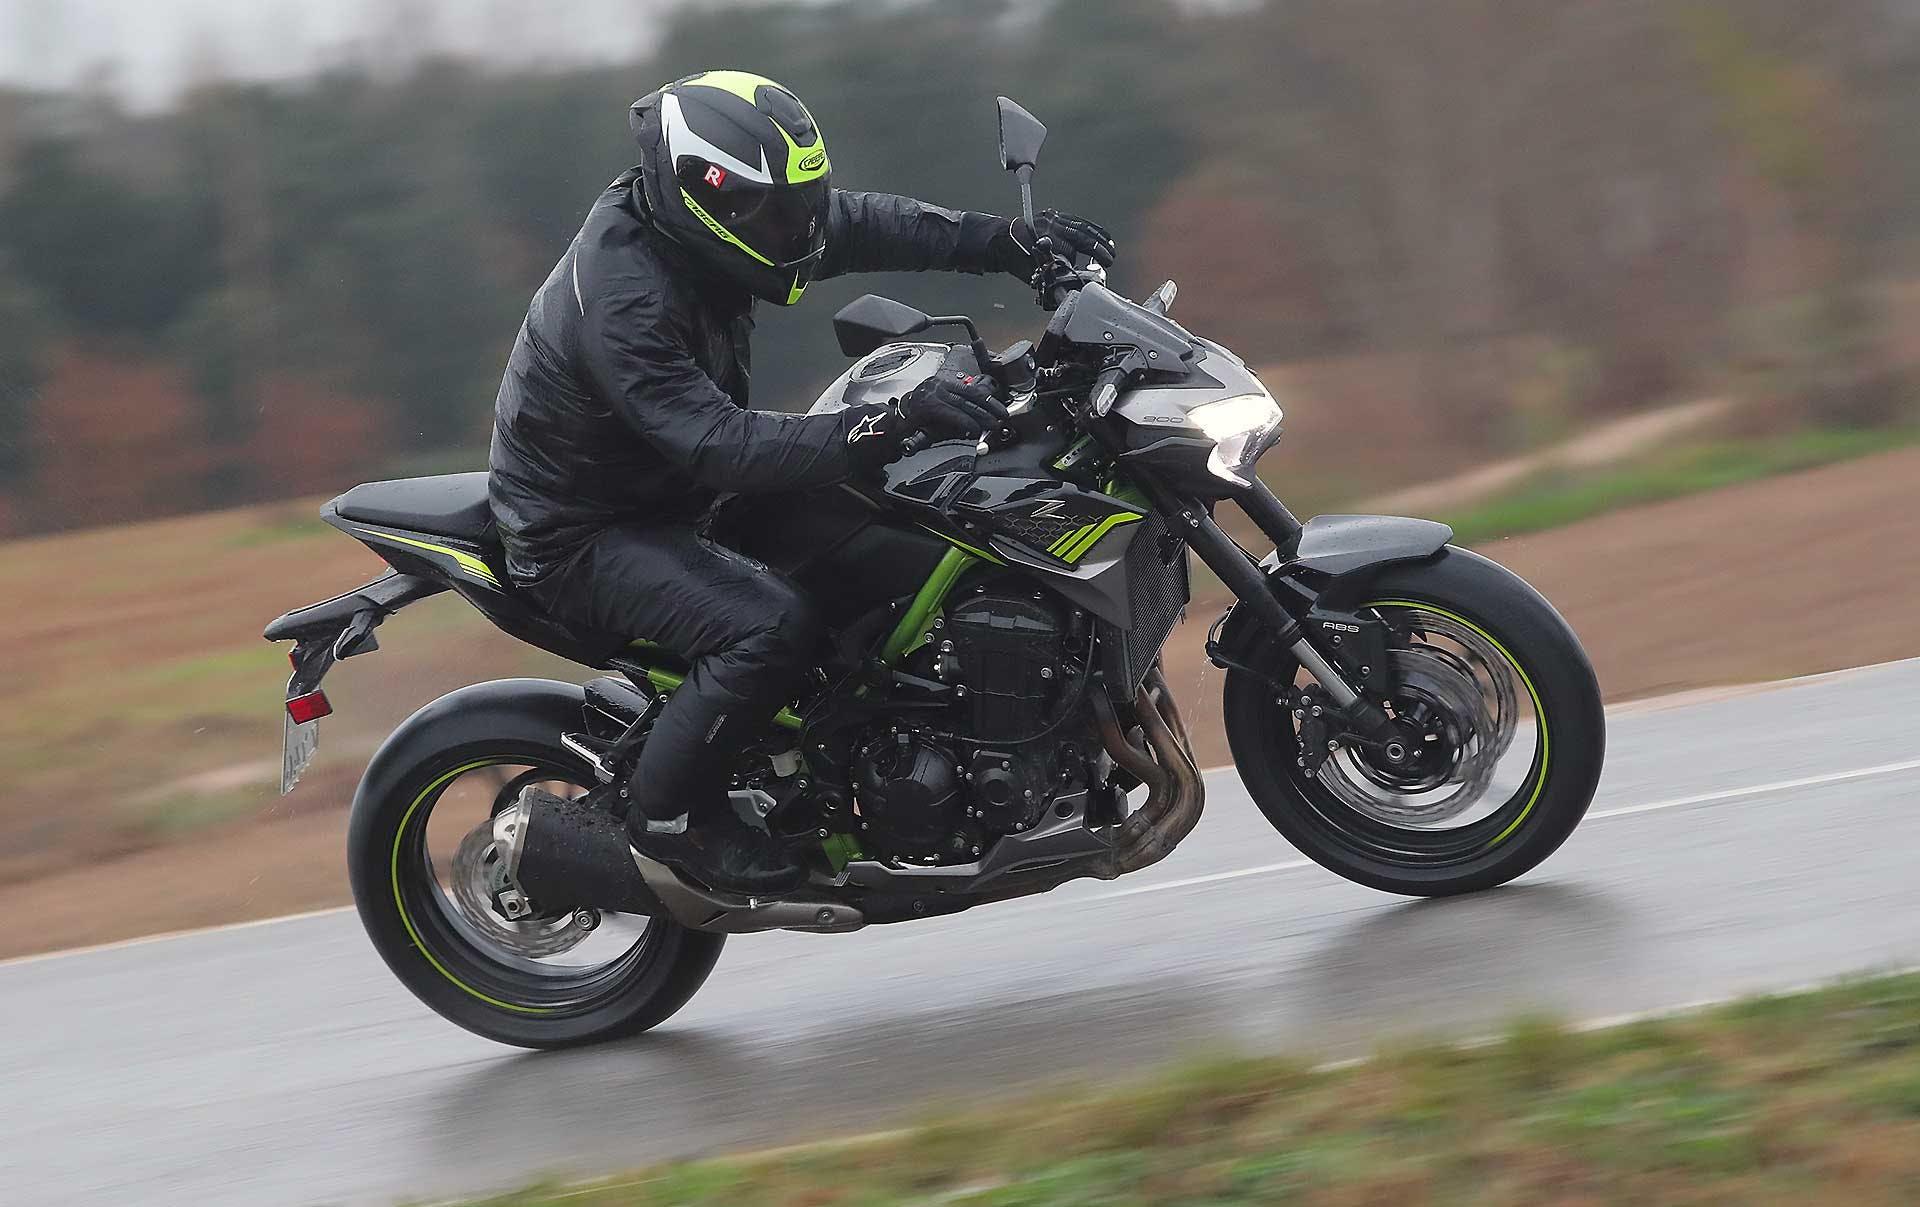 Prova Kawasaki Z900 2020 curva su strada bagnata